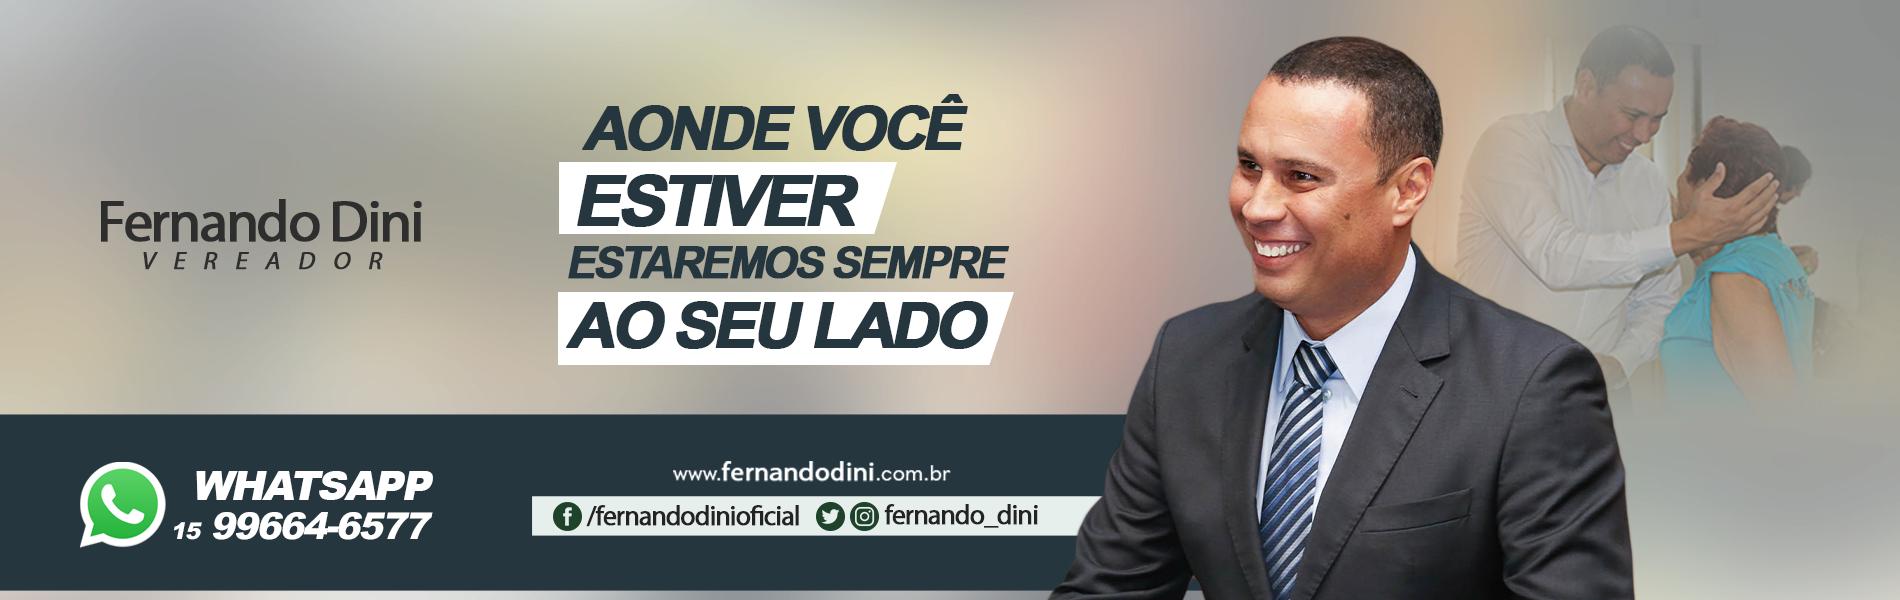 Fernando Dini